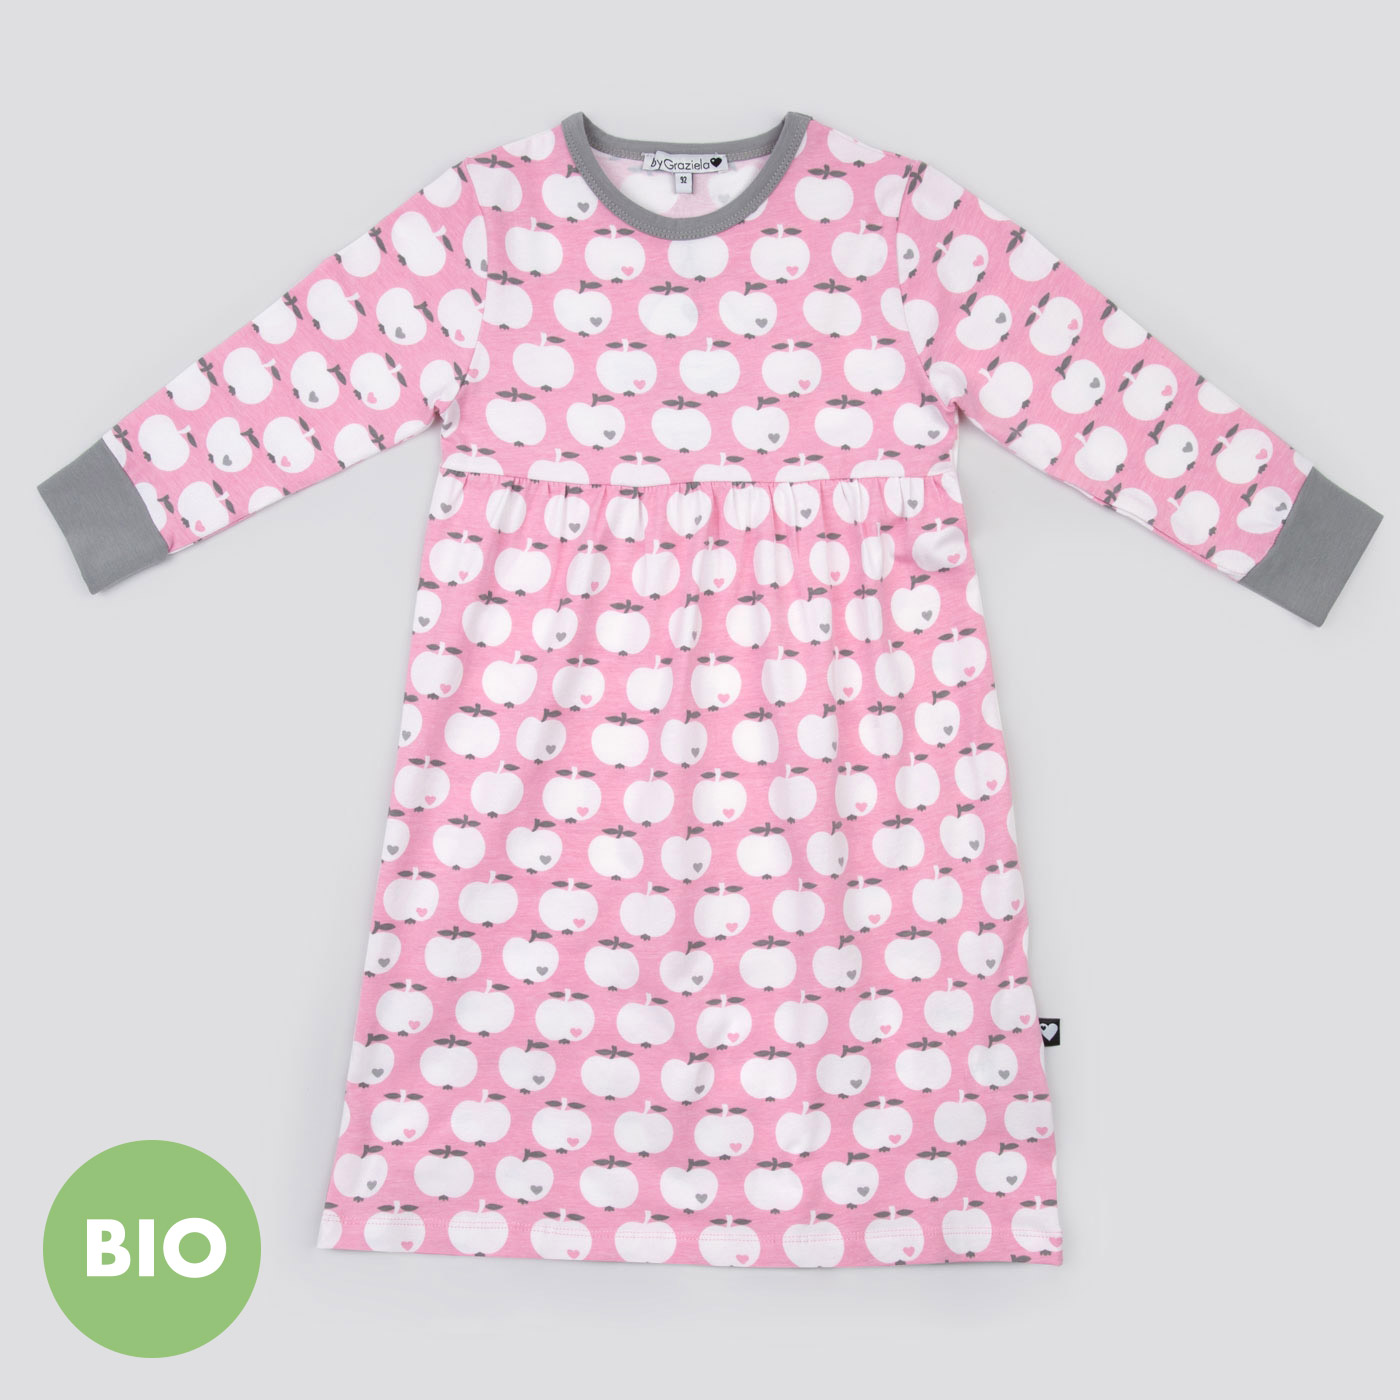 nachthemd apfel rosa grau bis 30 euro f r kinder geschenke bygraziela. Black Bedroom Furniture Sets. Home Design Ideas